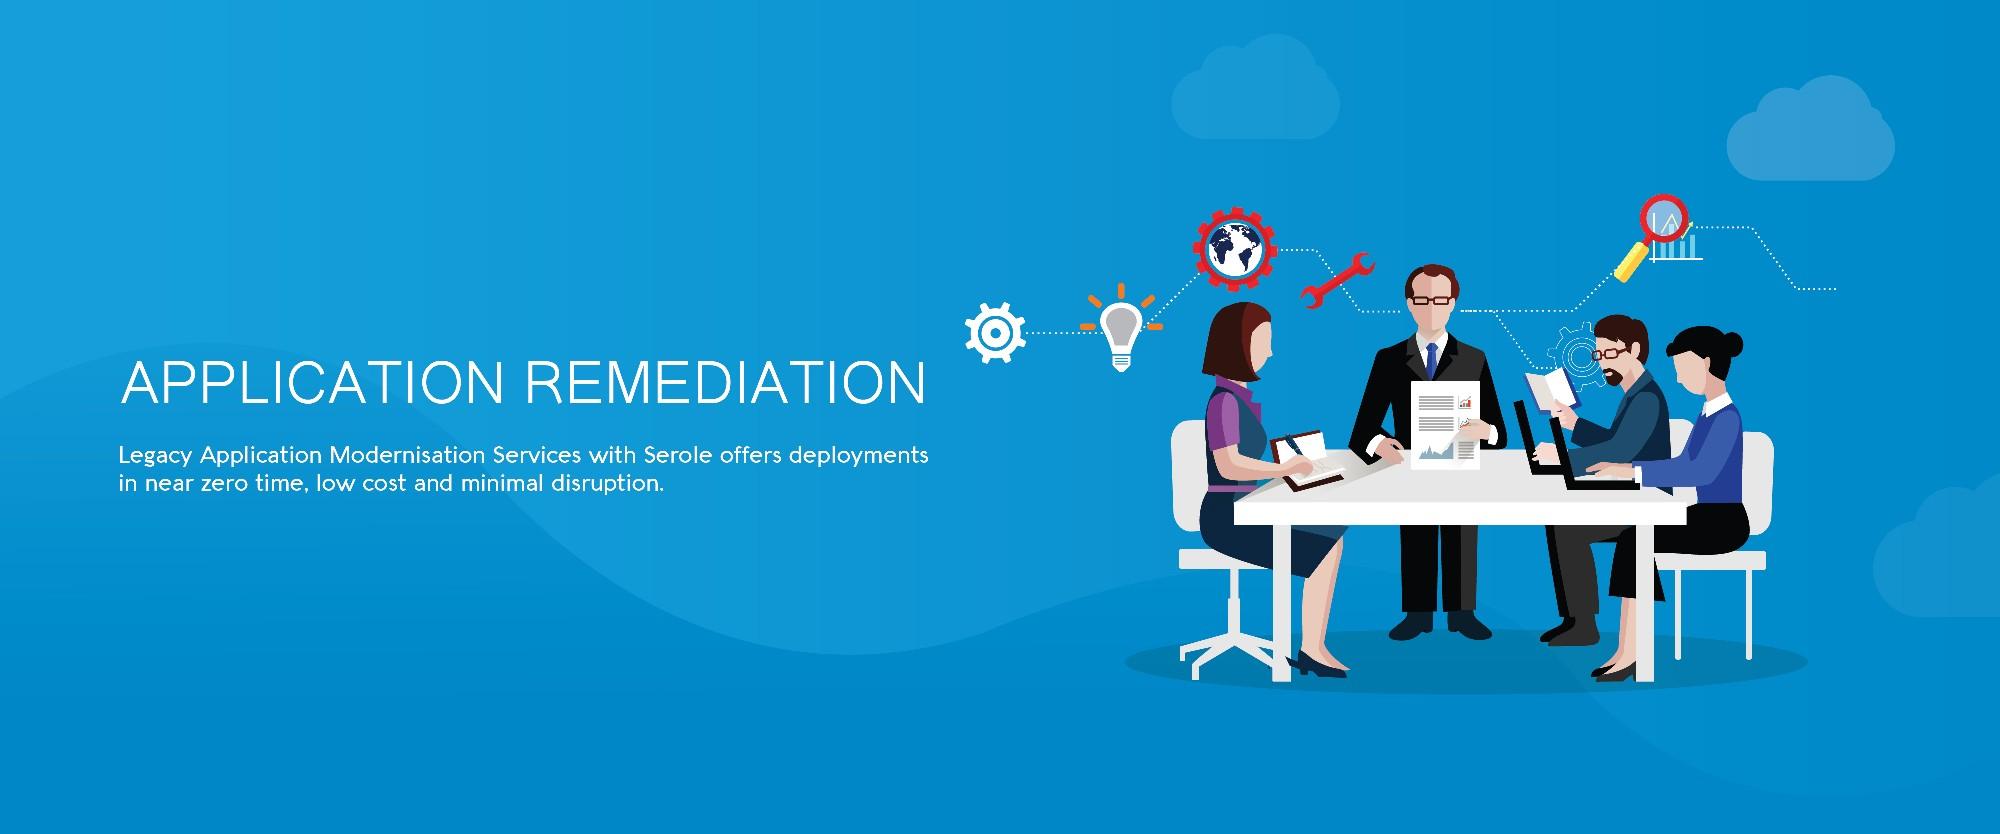 3.Application Remediation banner-01